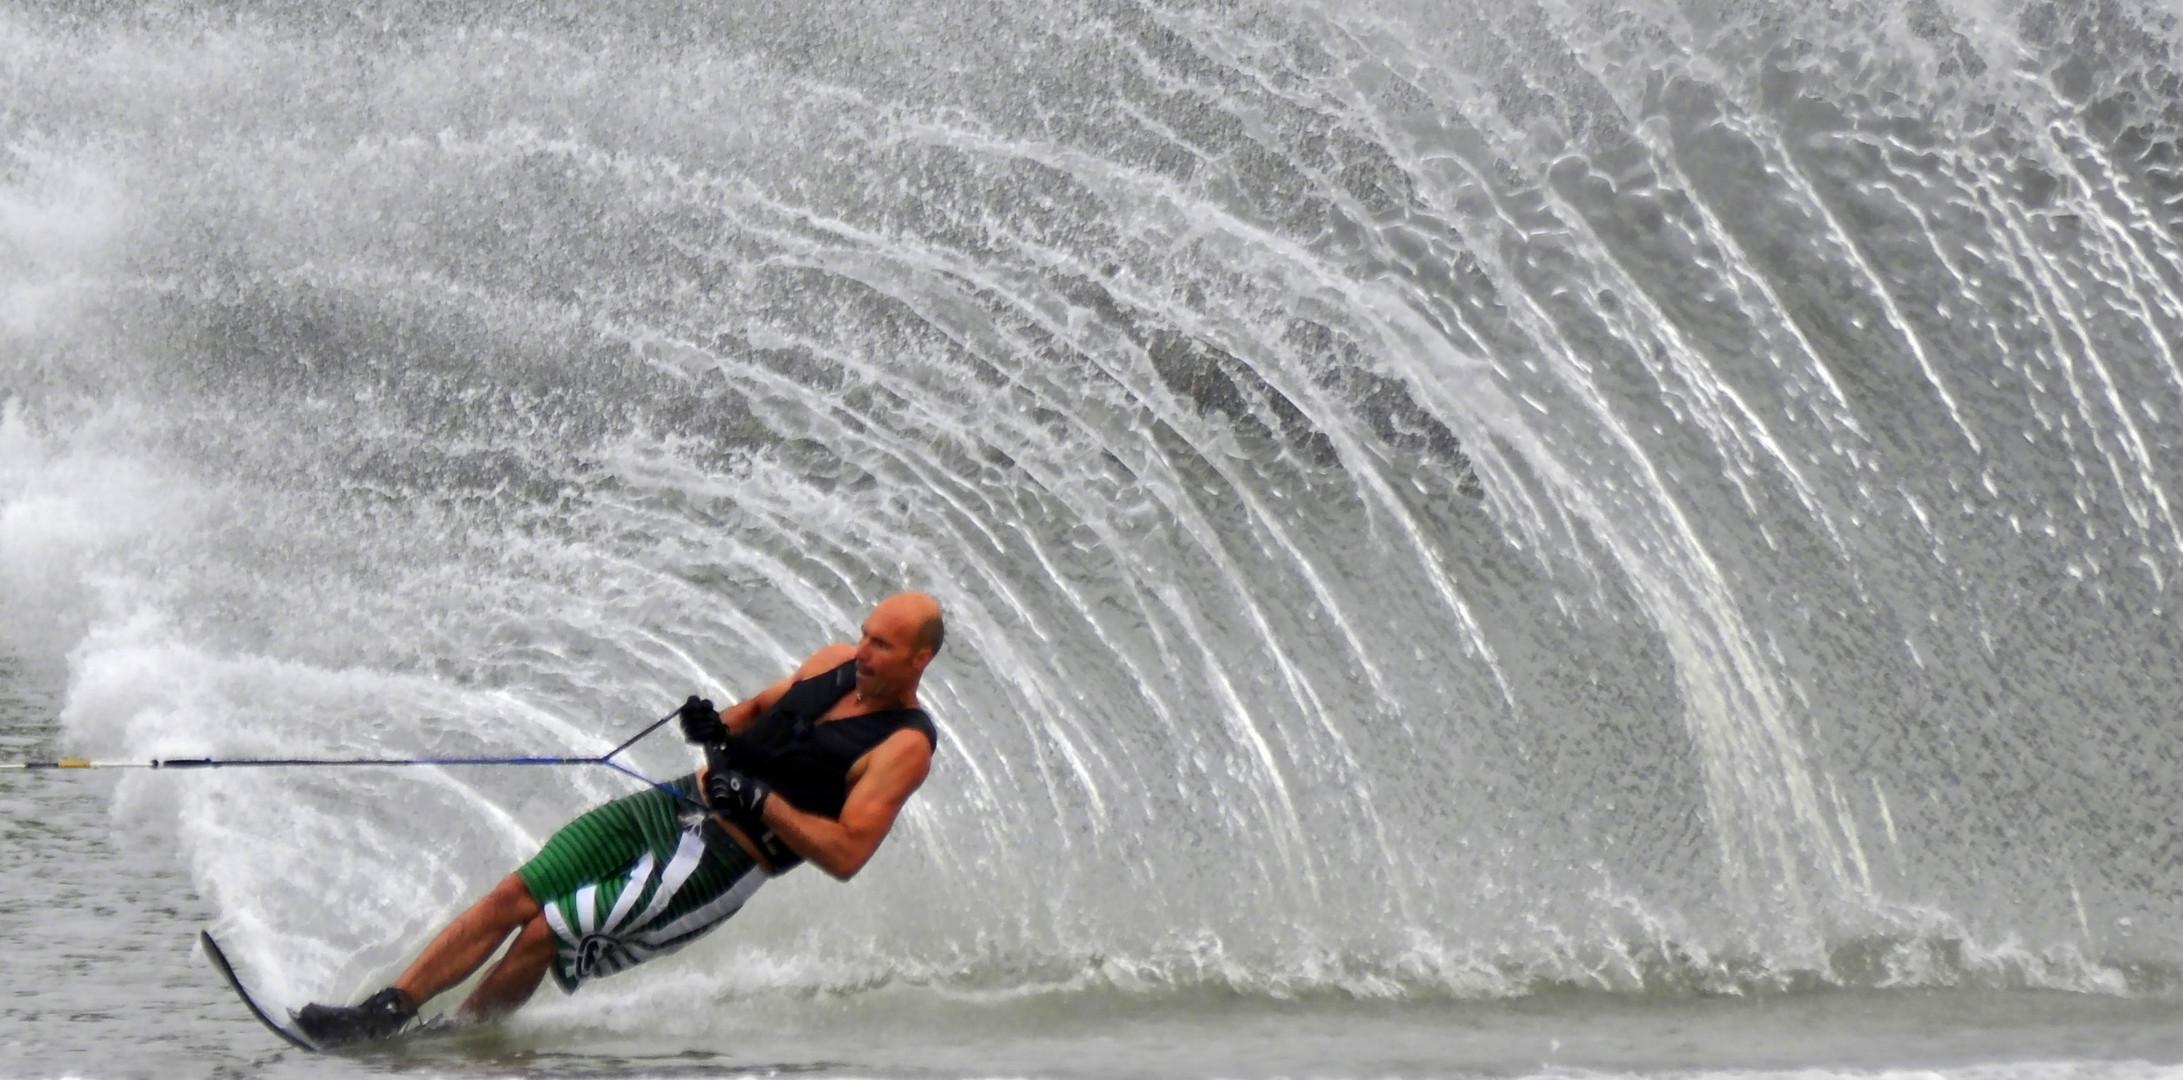 Wasserski Slalom 3